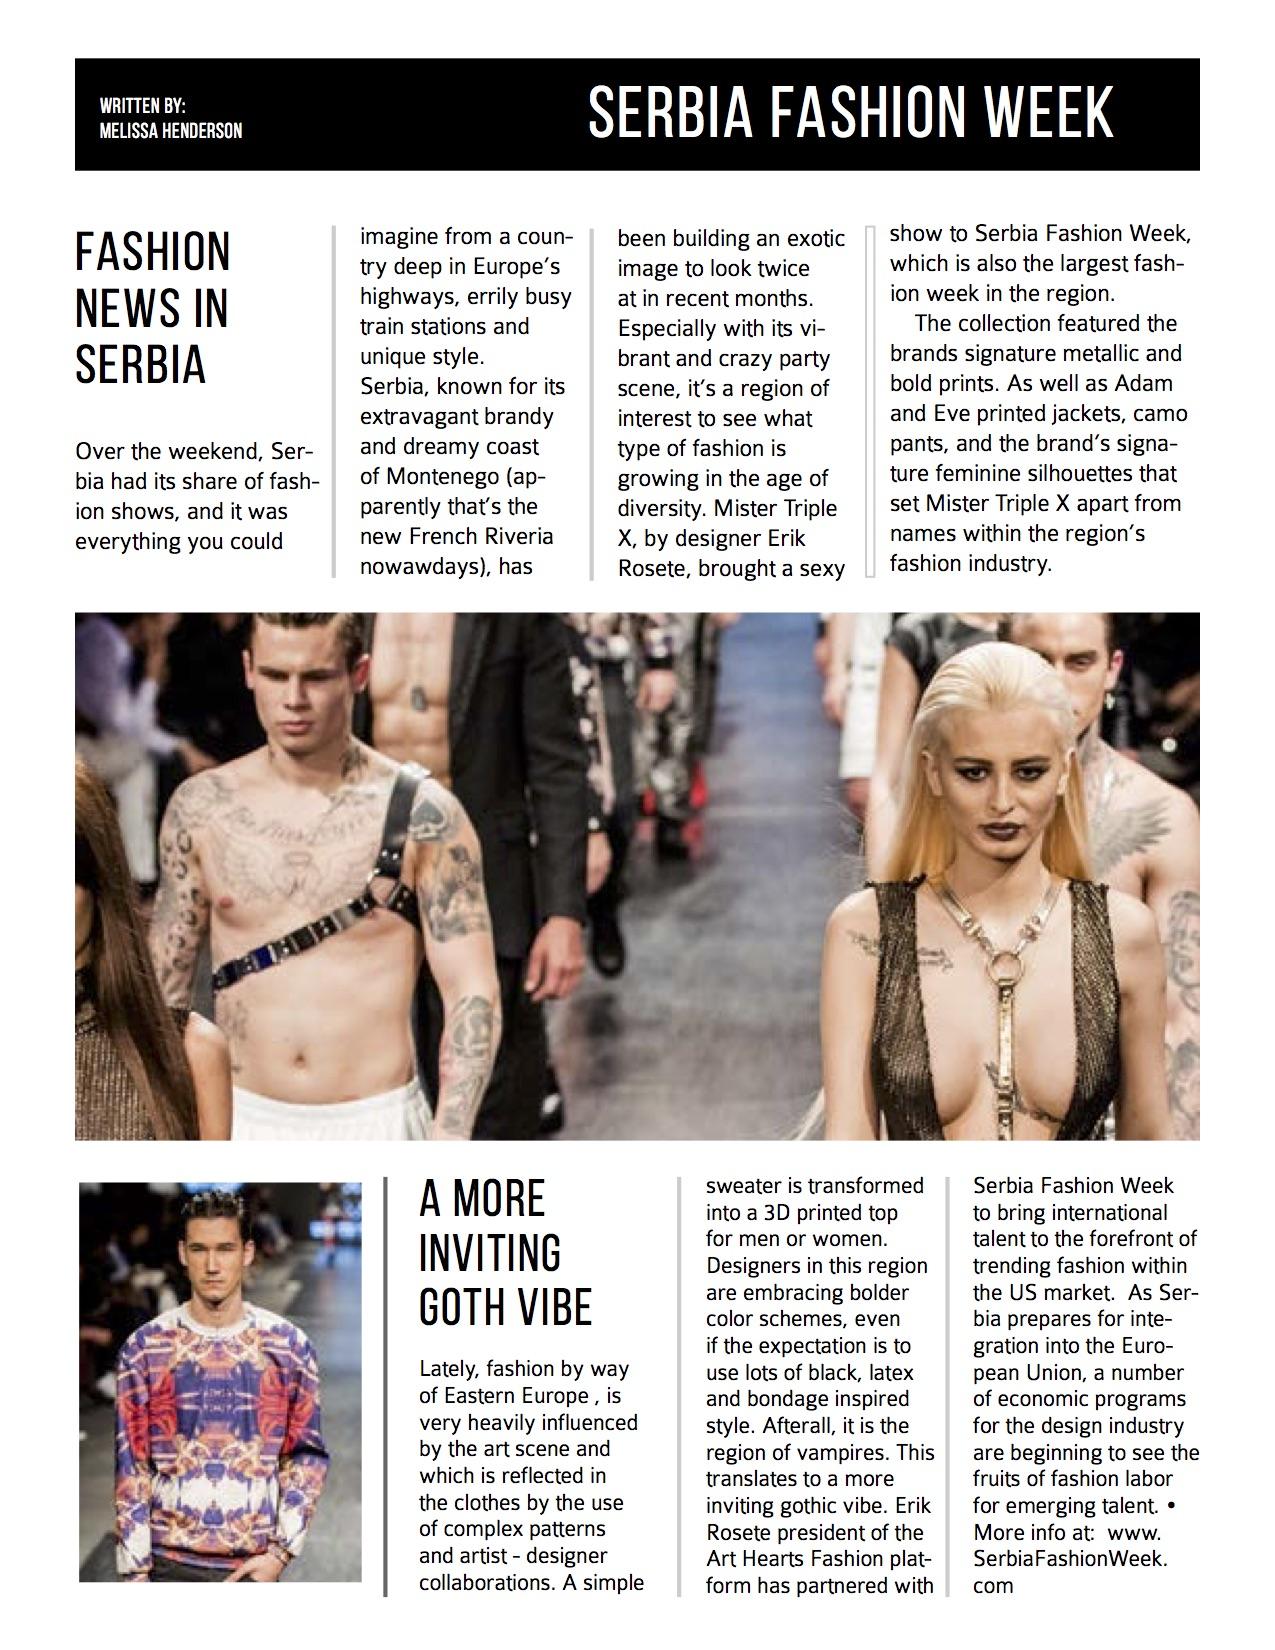 Photo Credit: Serbia Fashion Week